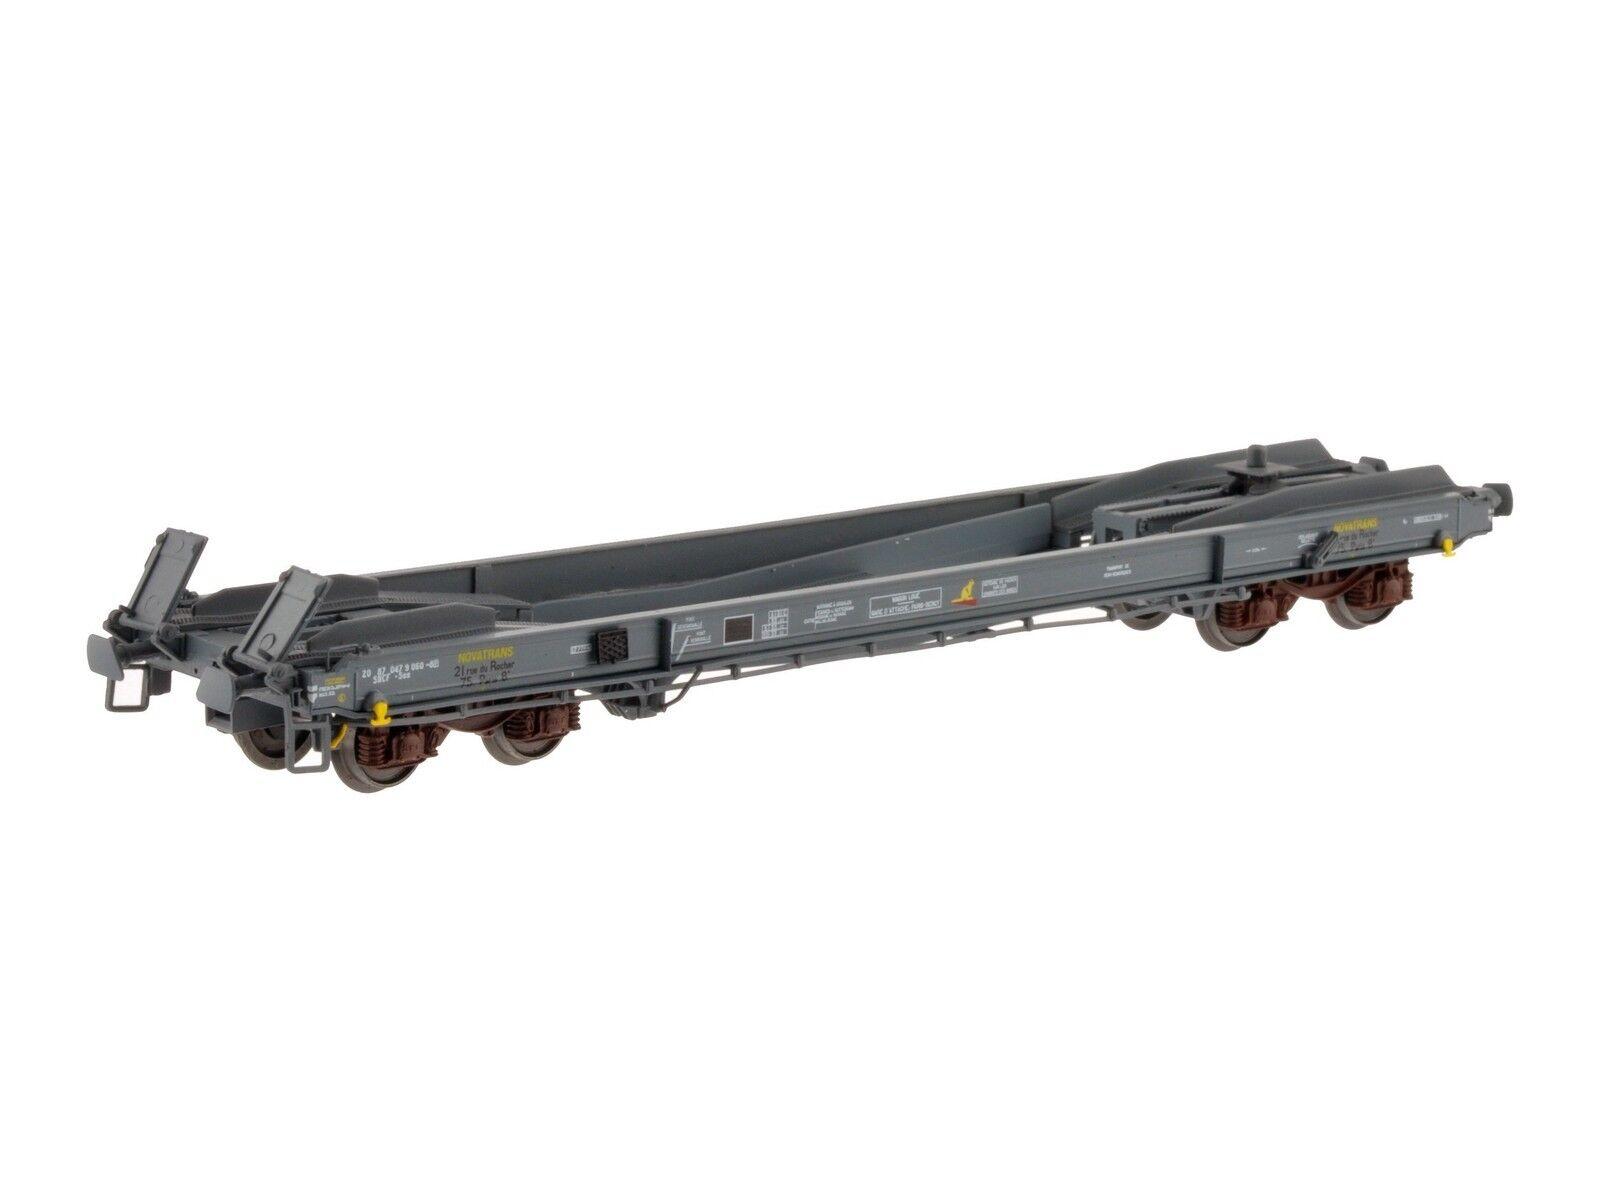 LS Models 30135 SNCF 4achs Wechselbehältertragwg KB NOVATRANS grau Ep4 NEU